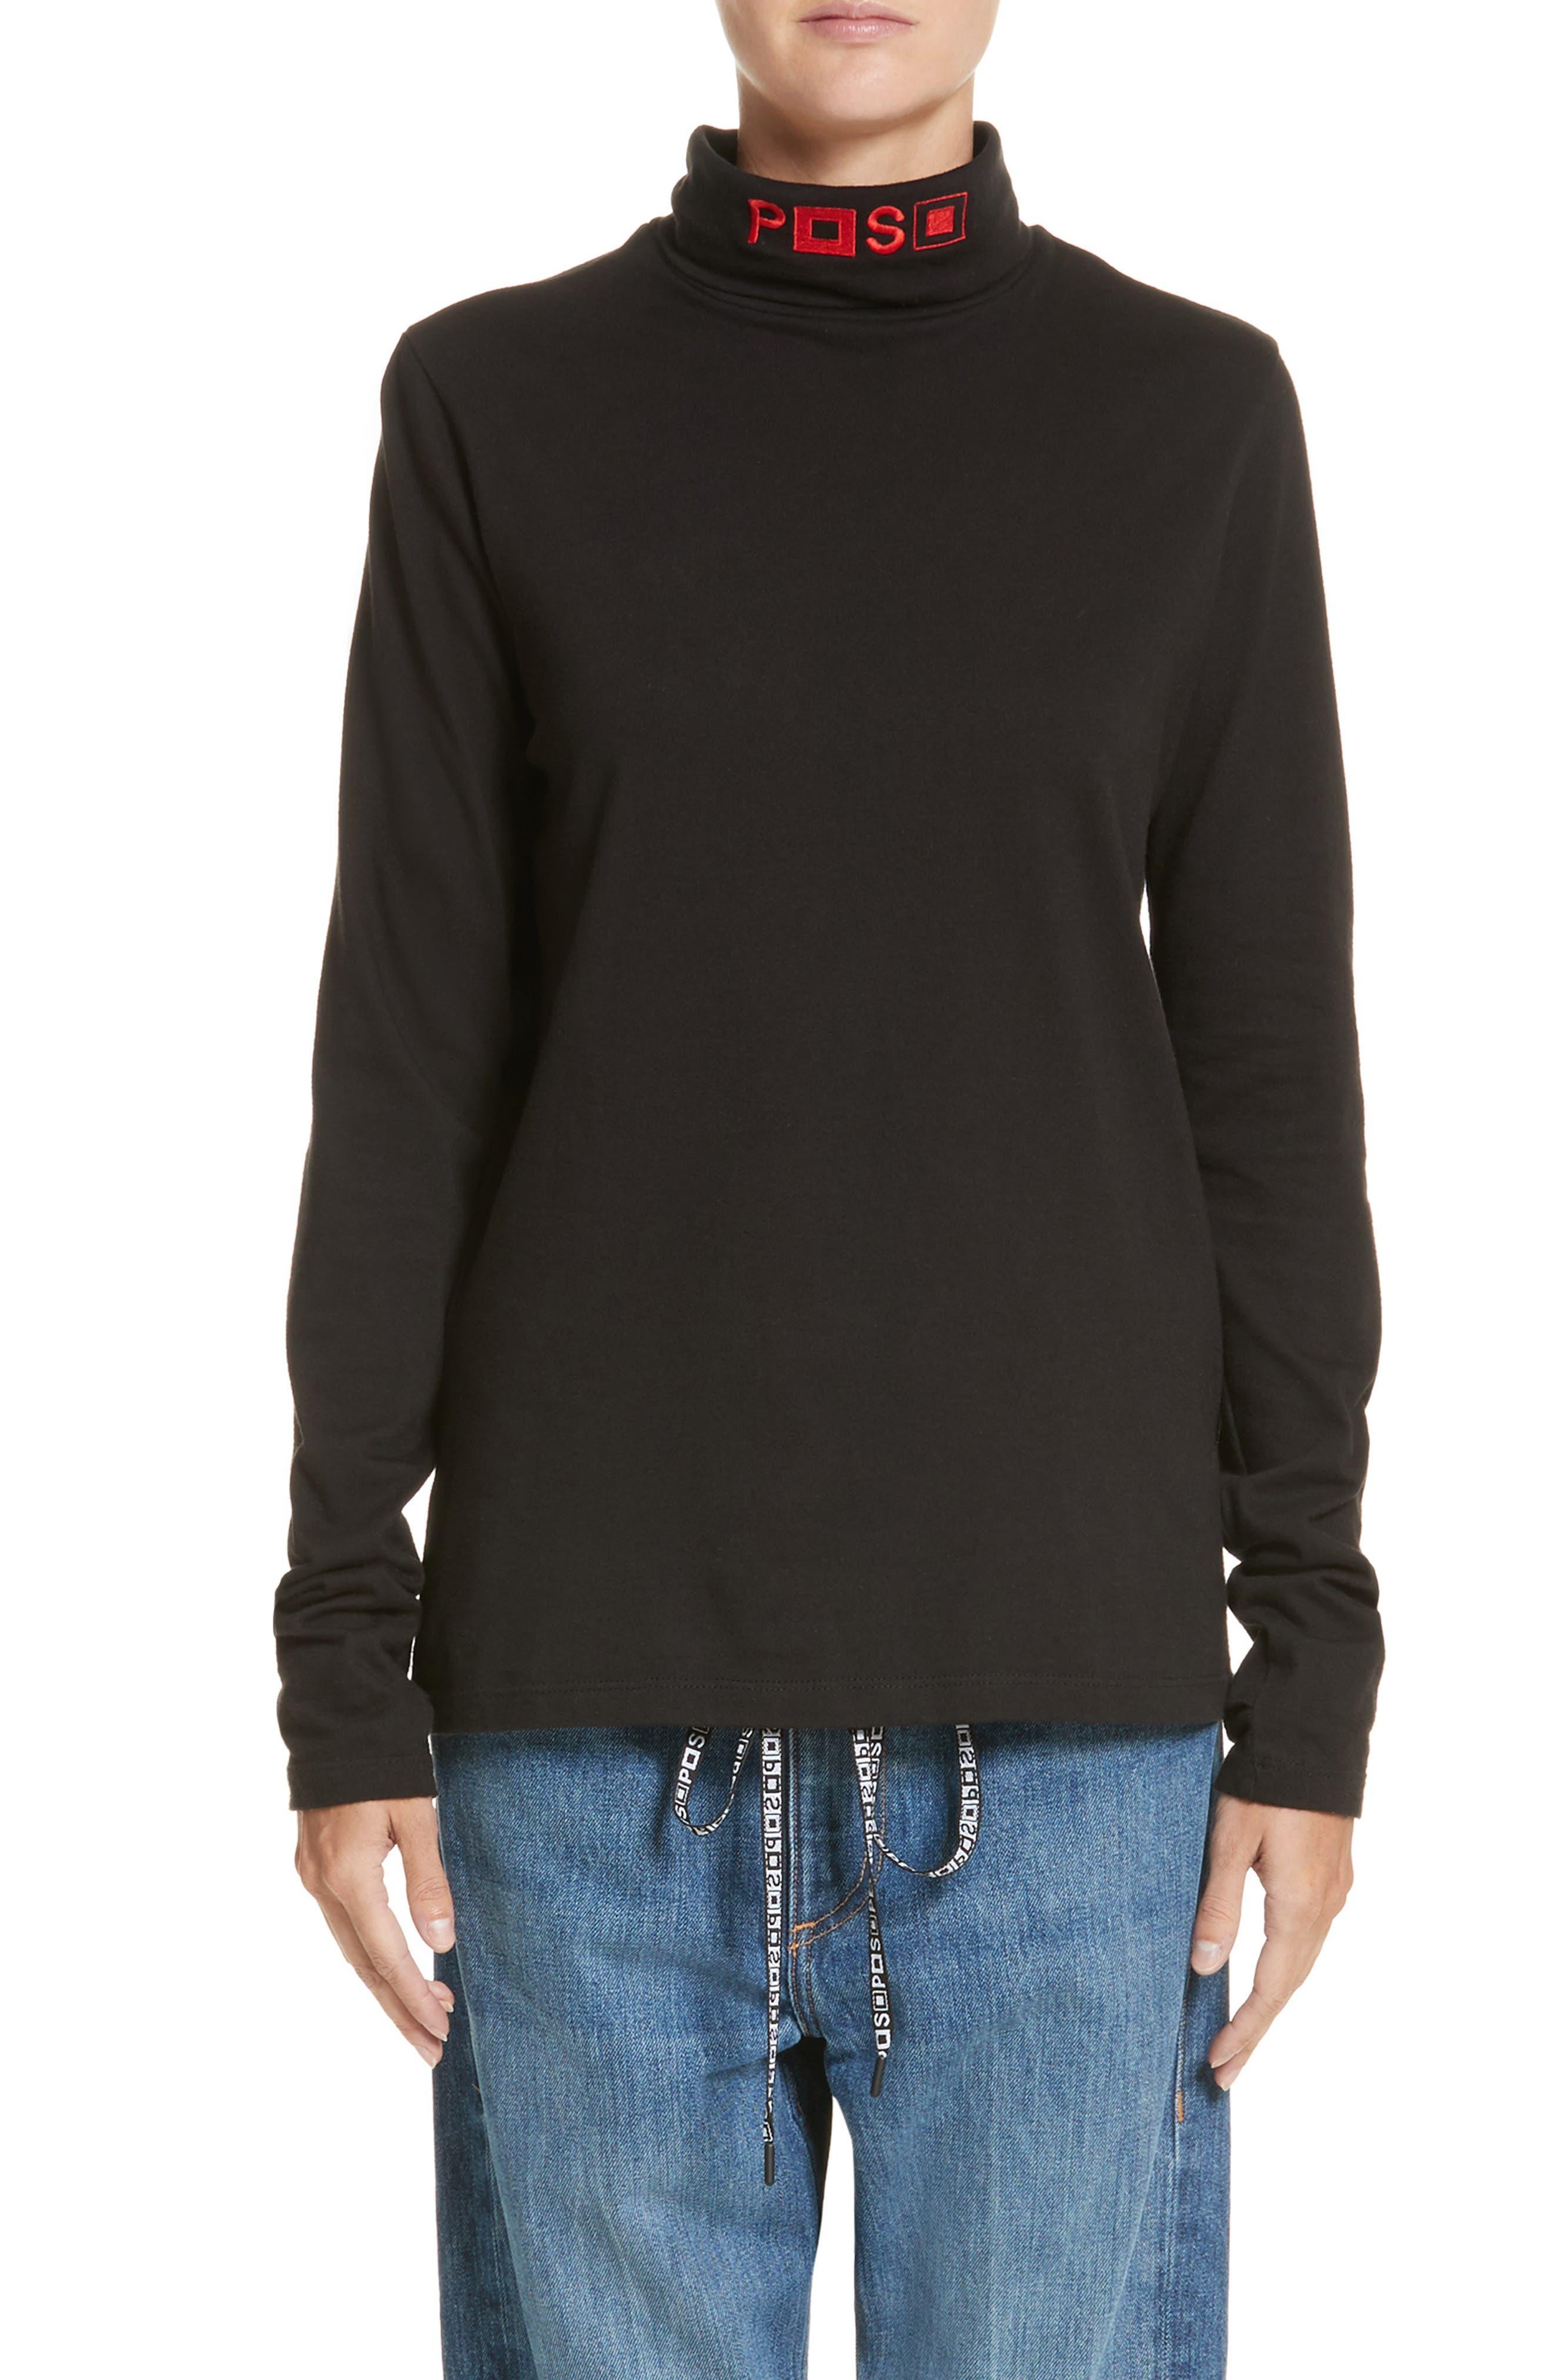 PSWL Embroidered Jersey Turtleneck,                         Main,                         color, Black